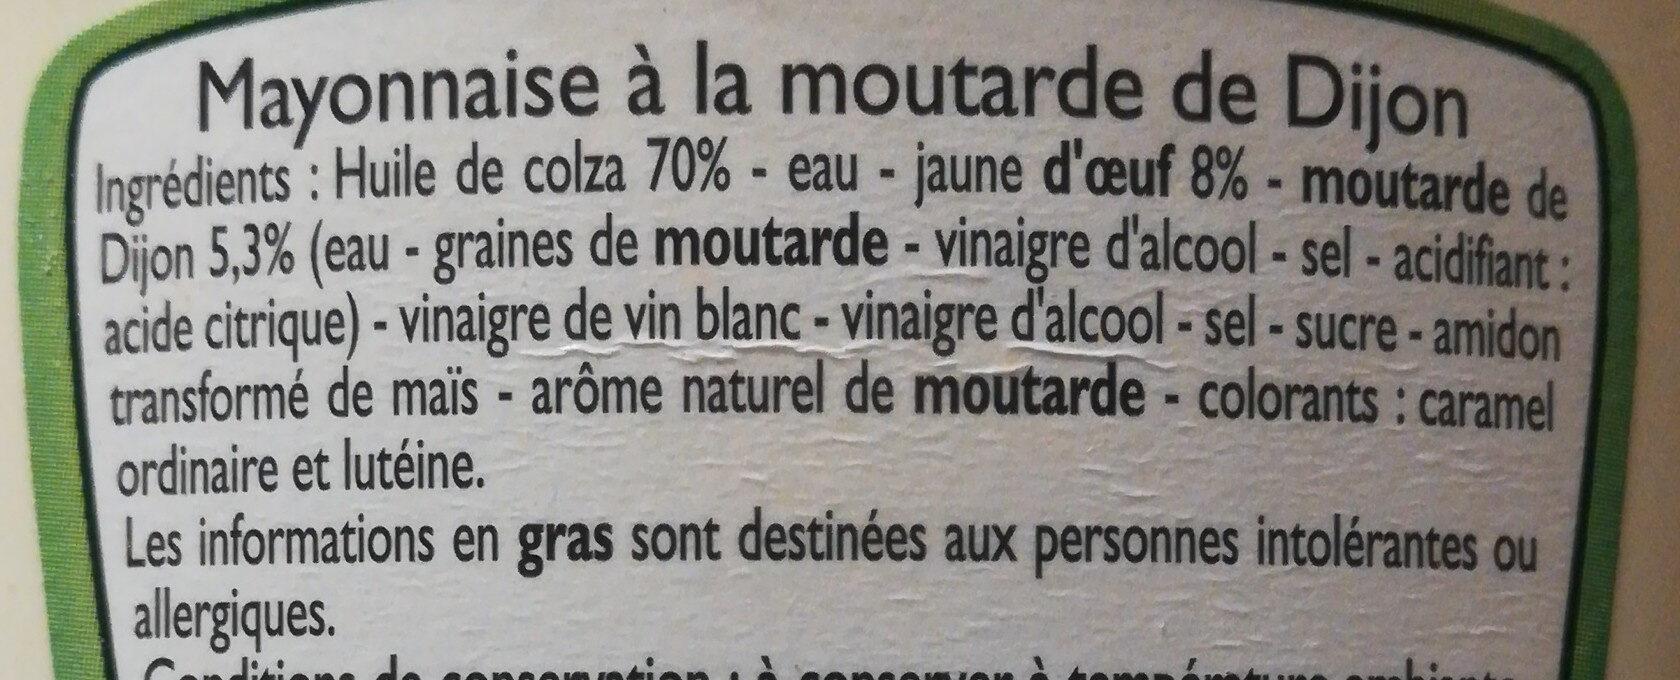 Mayonnaise a la moutarde de dijon - Ingredients - fr